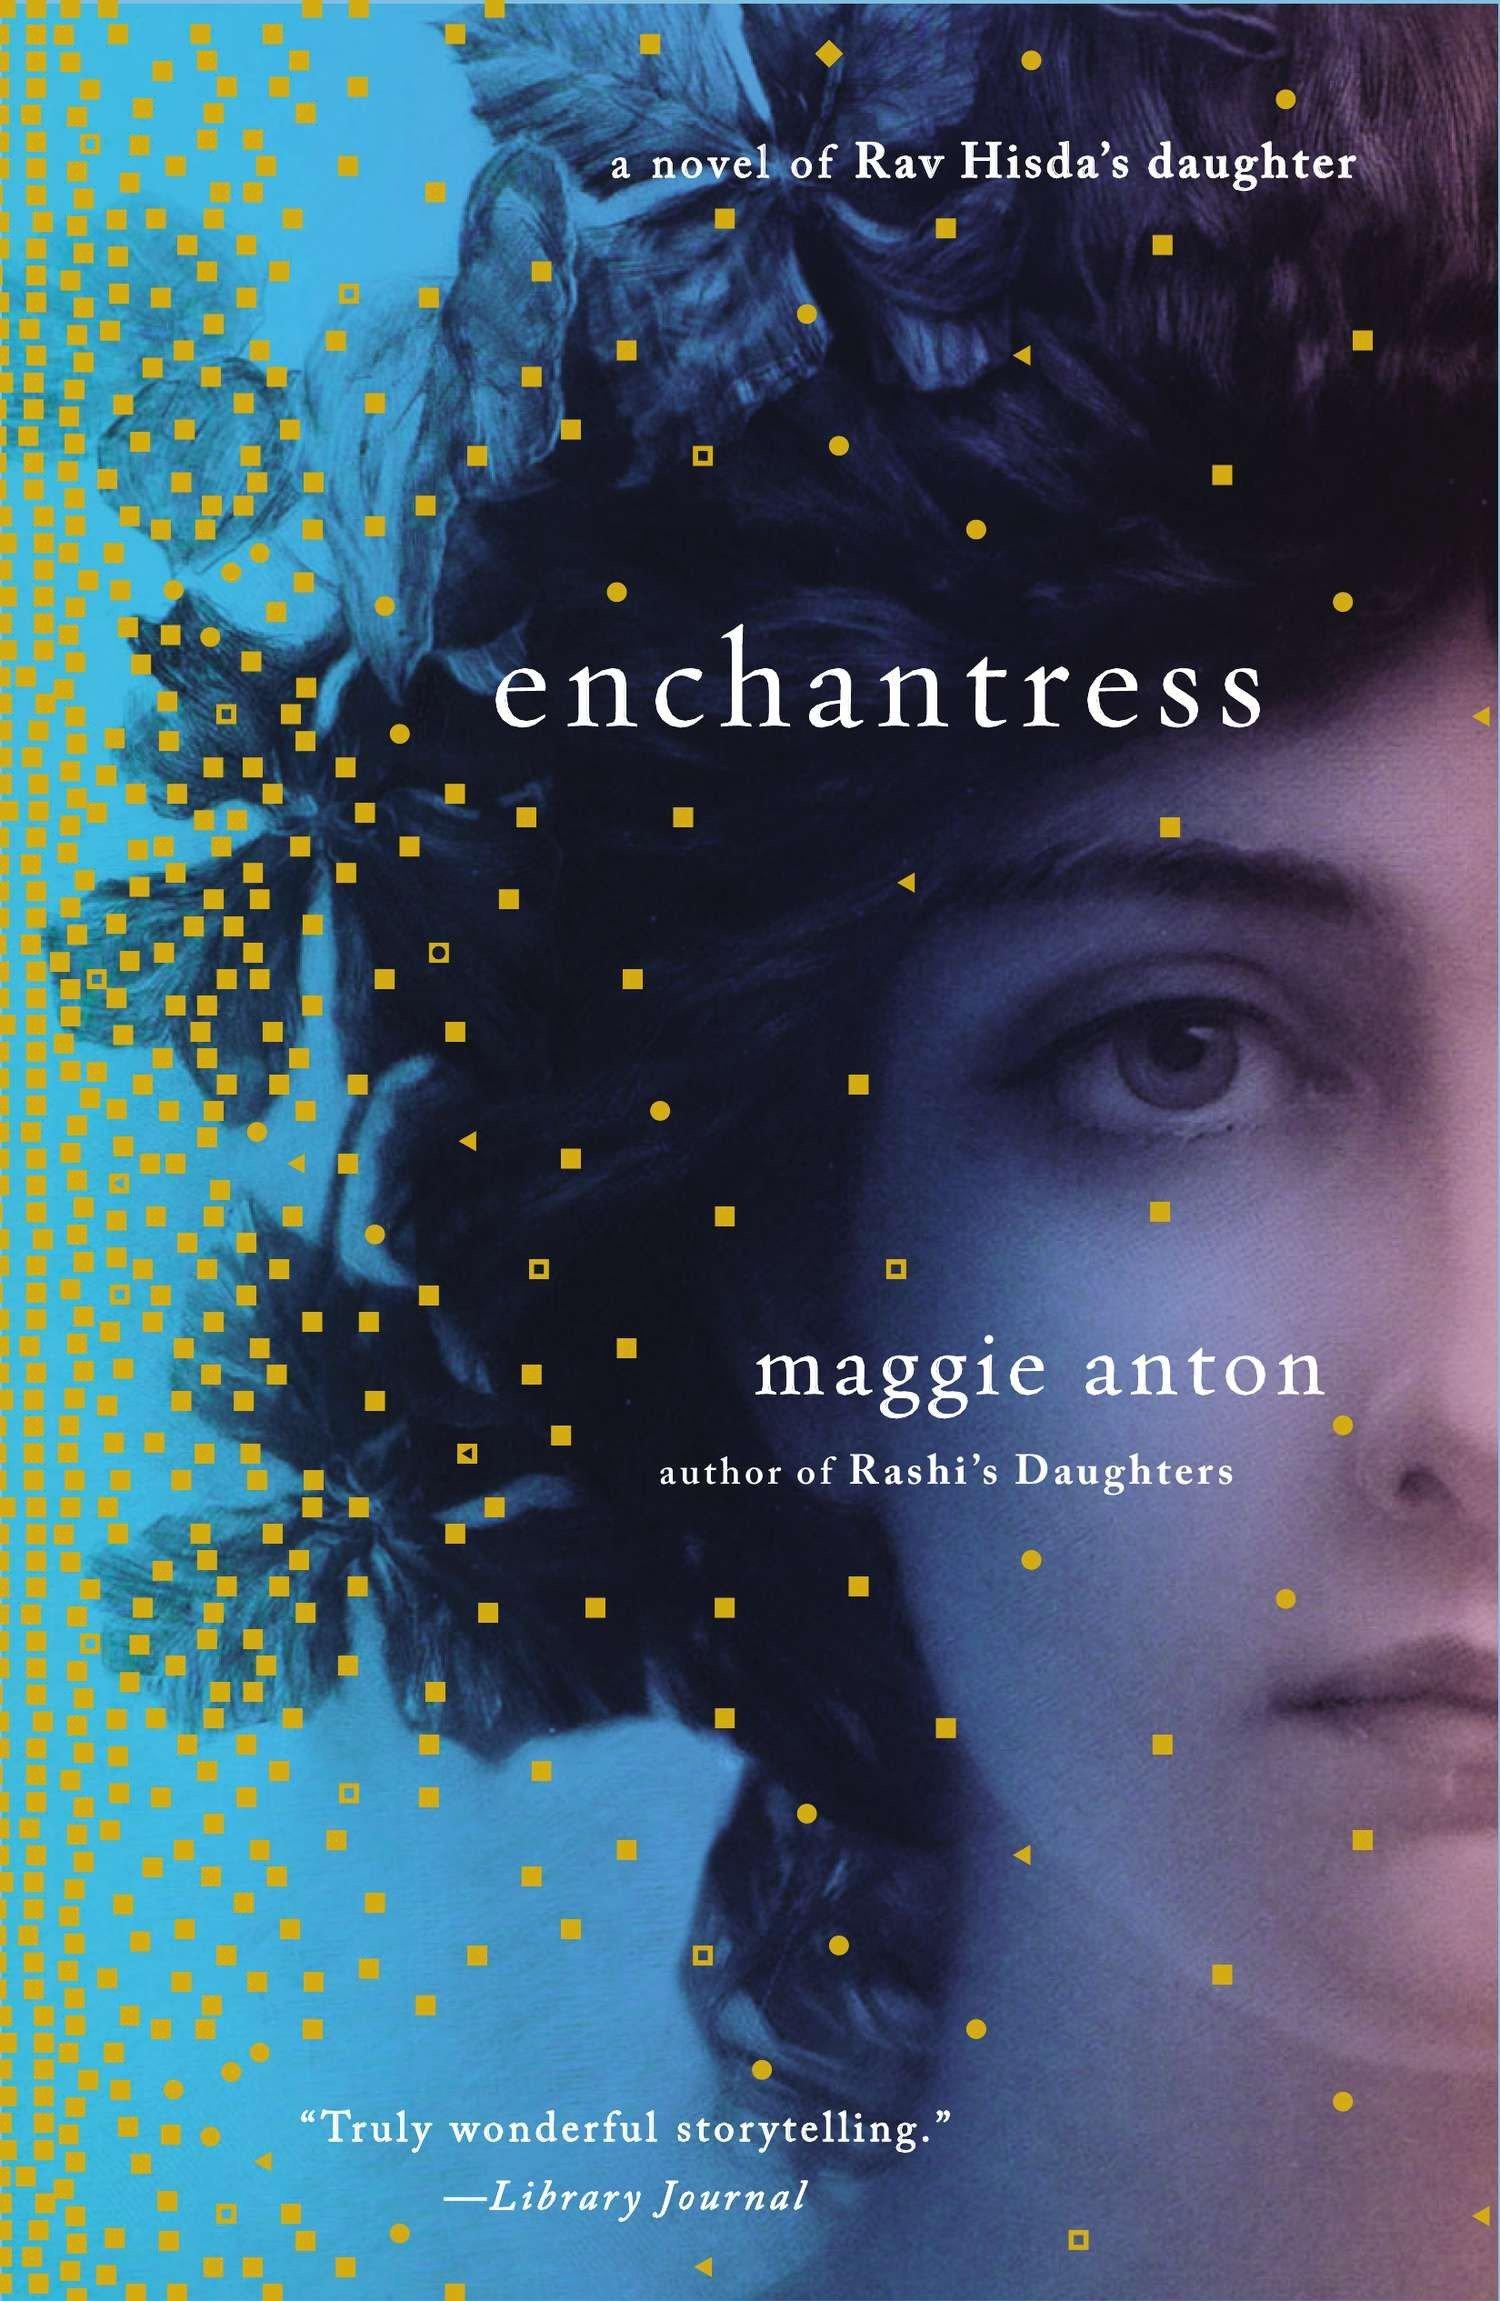 Amazon.com: Enchantress: A Novel of Rav Hisda's Daughter (Rav Hisda's  Daughter Series) (9780452298224): Maggie Anton: Books